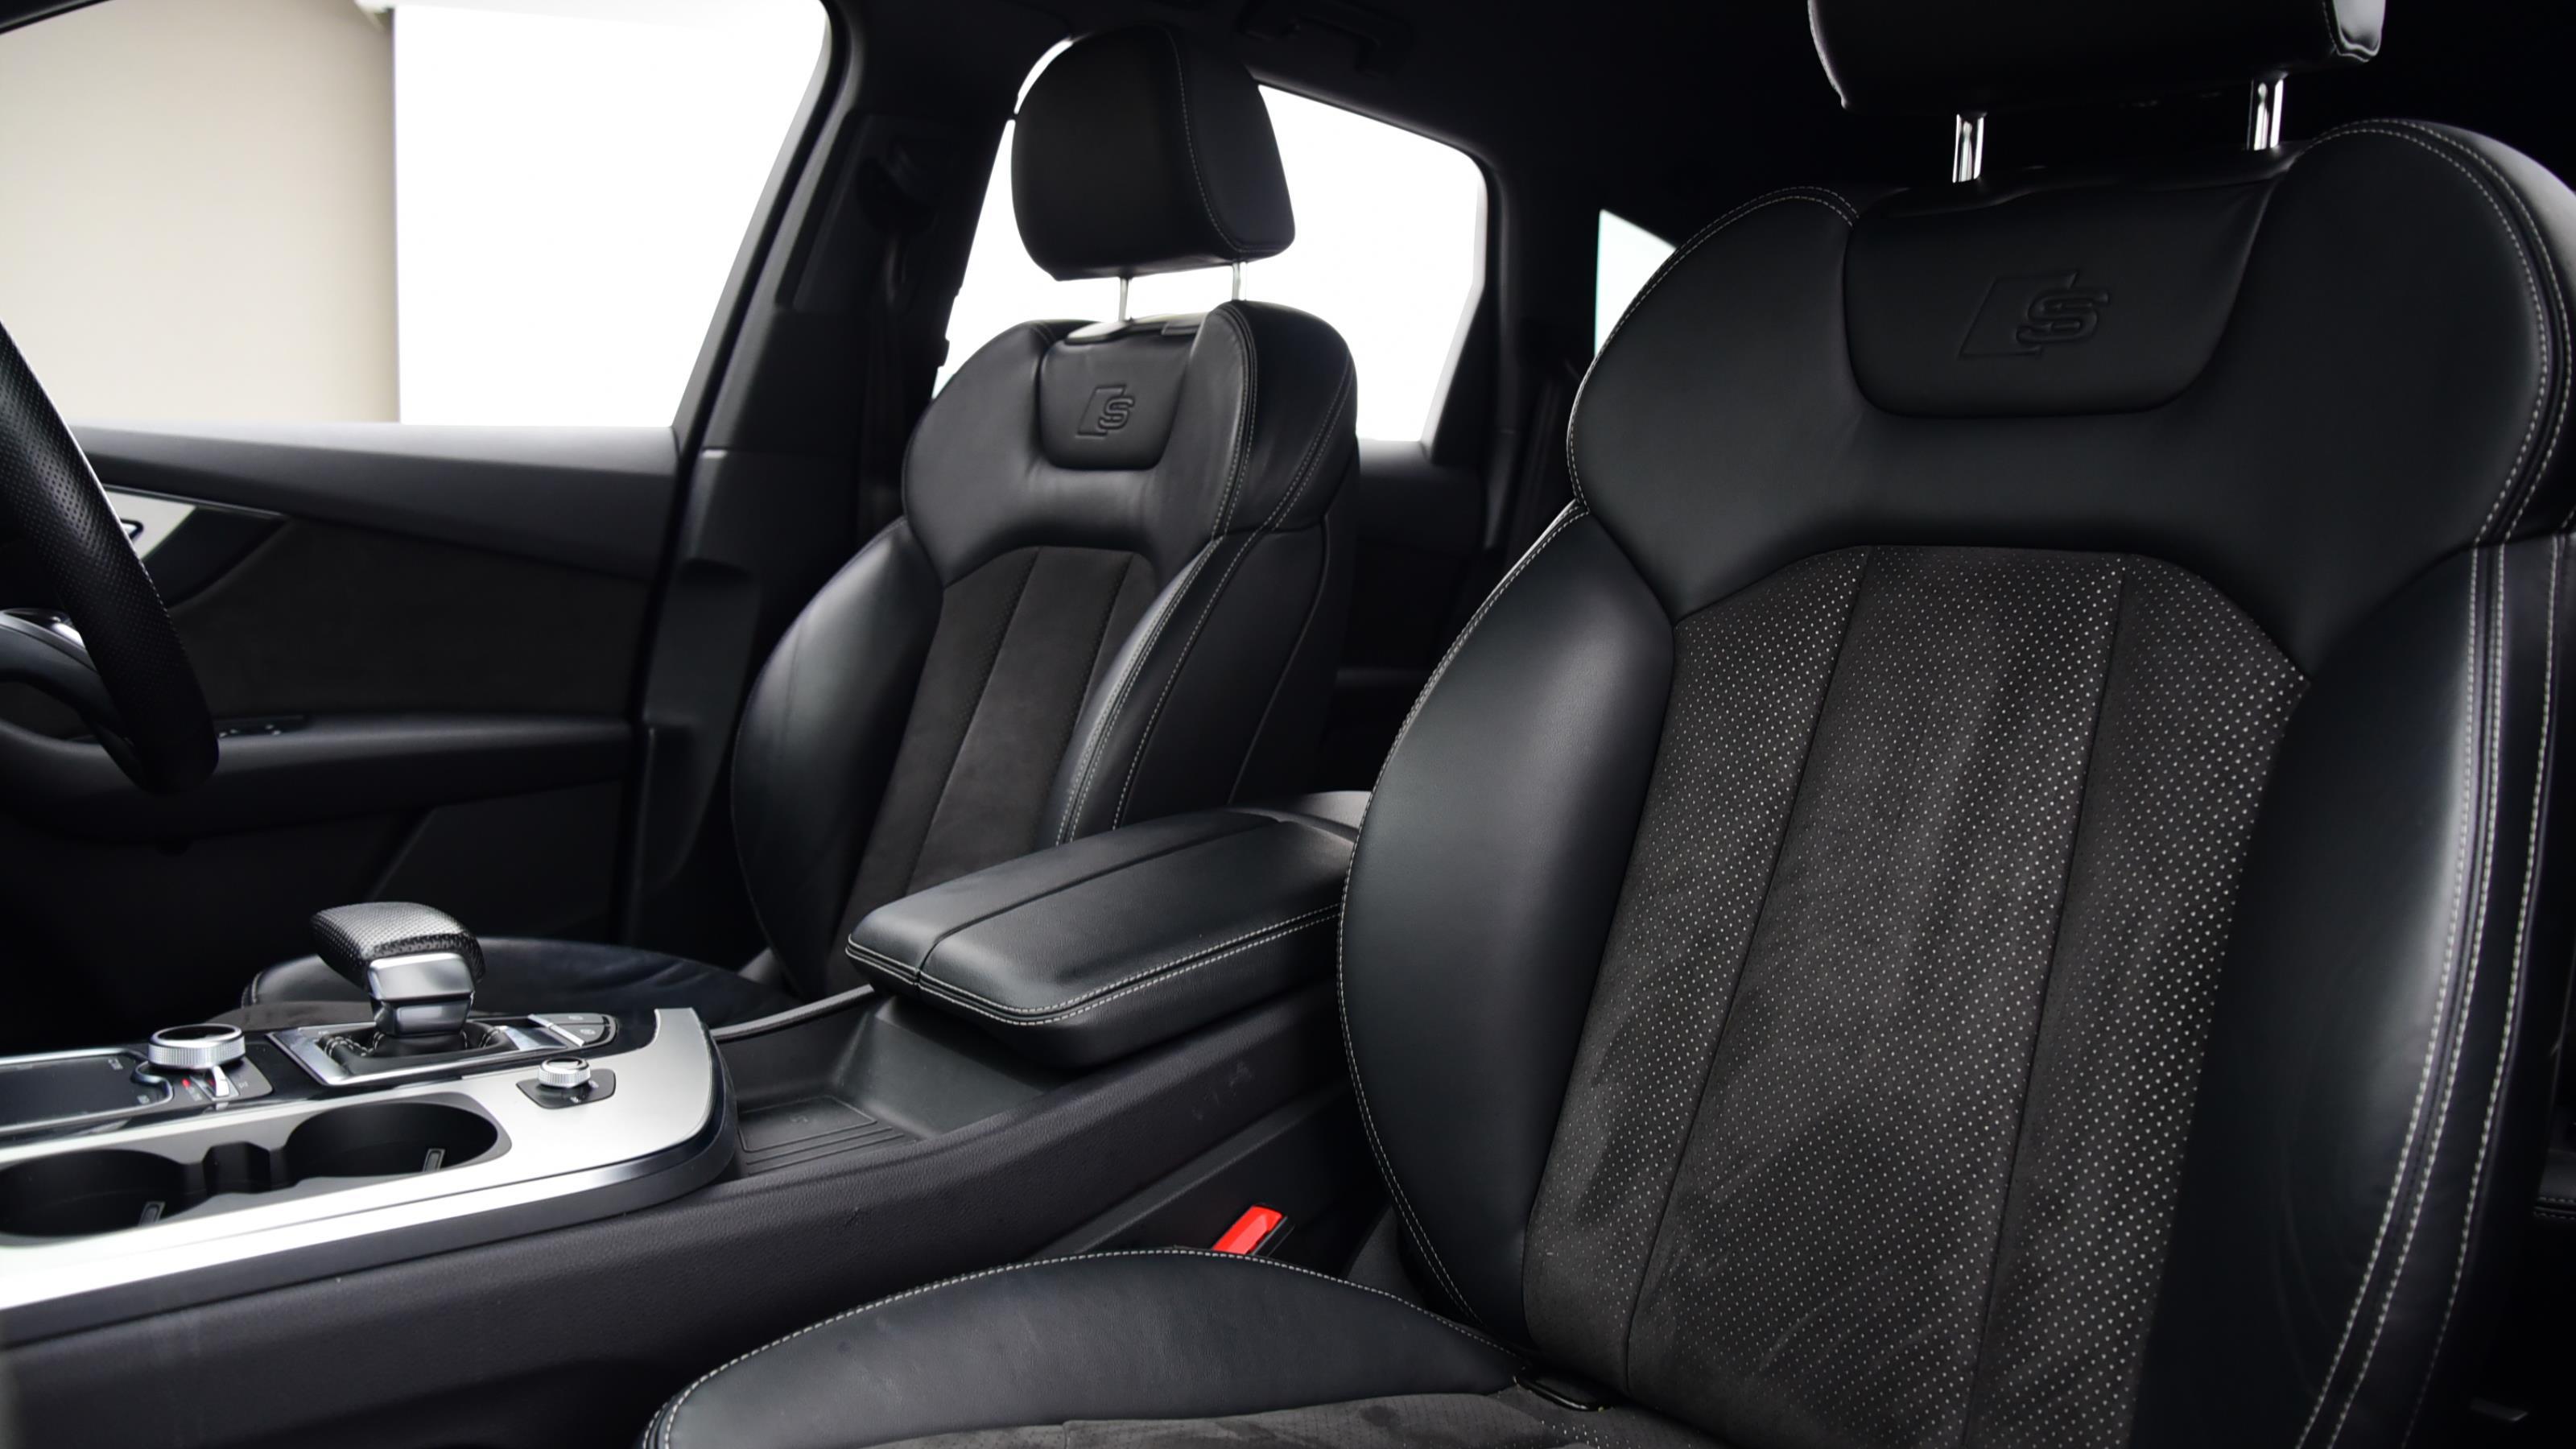 Used 2016 Audi Q7 3.0 TDI 218 Quattro S Line 5dr Tip Auto BLACK at Saxton4x4